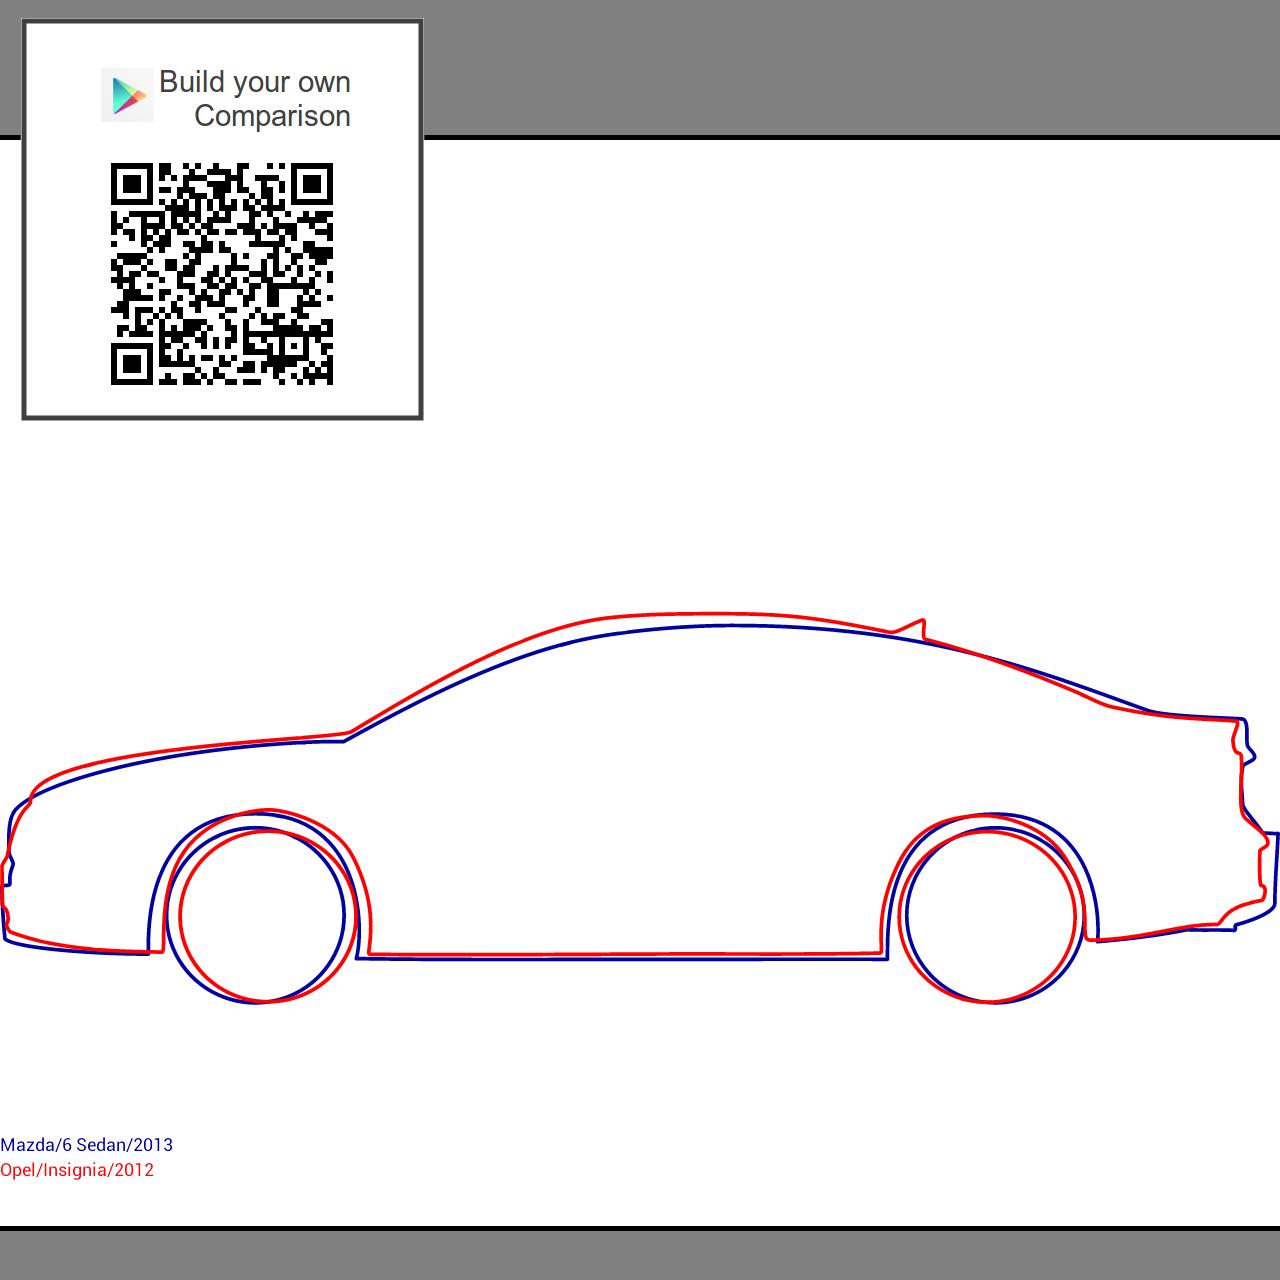 Vauxhall Mokka X Active Turbo S S Hatchback: Mazda 6 2013 Vs Opel/Vauxhall/Buick Insignia 2012